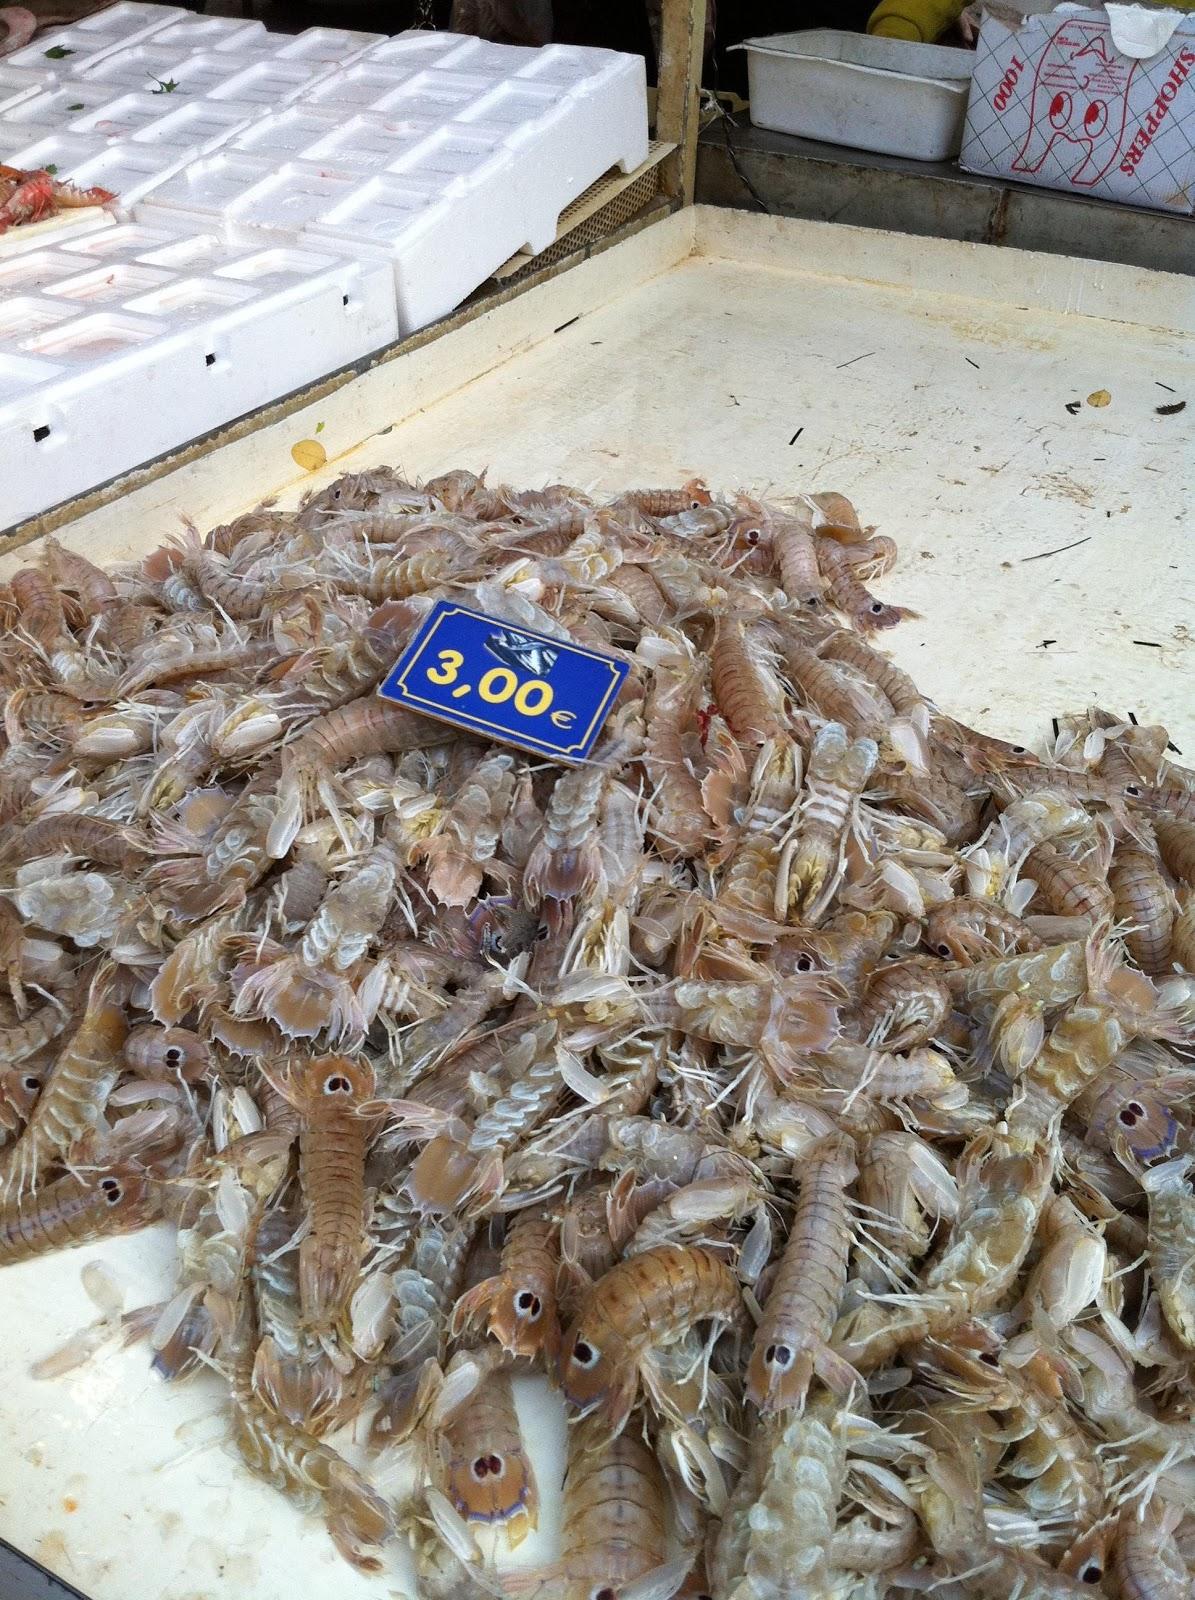 la cucina economica: canocchie, pannocchie o cicale di mare? - Cucinare Le Canocchie